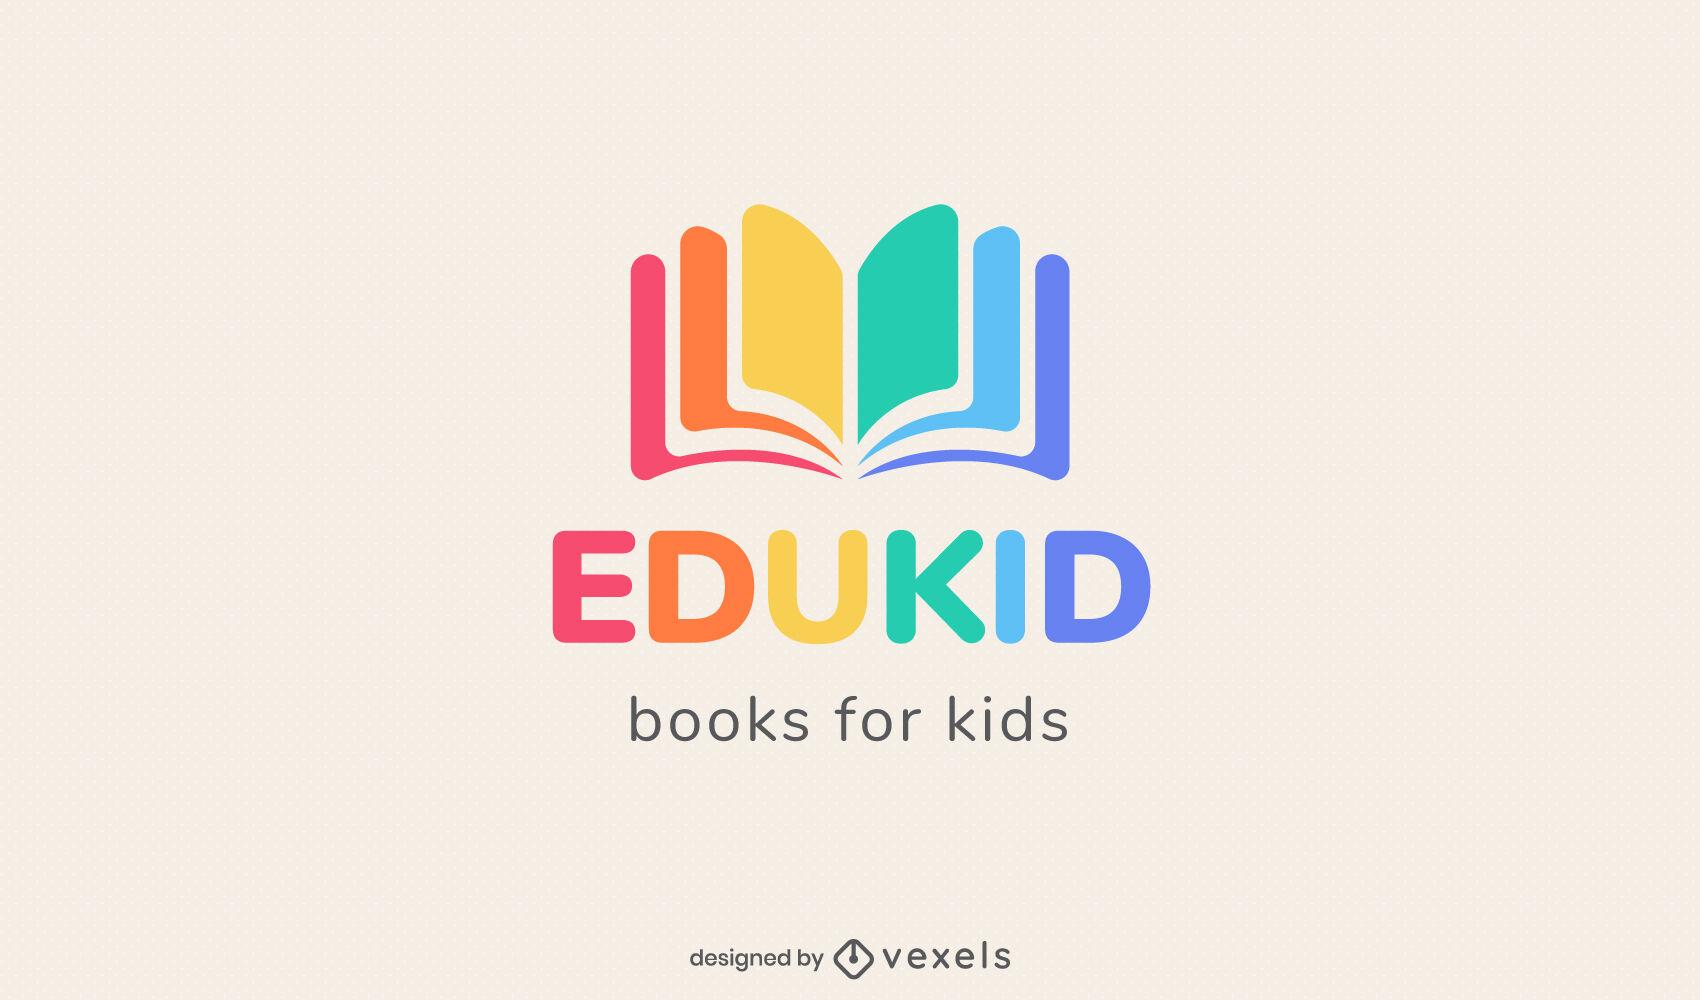 Rainbow colored open book logo design